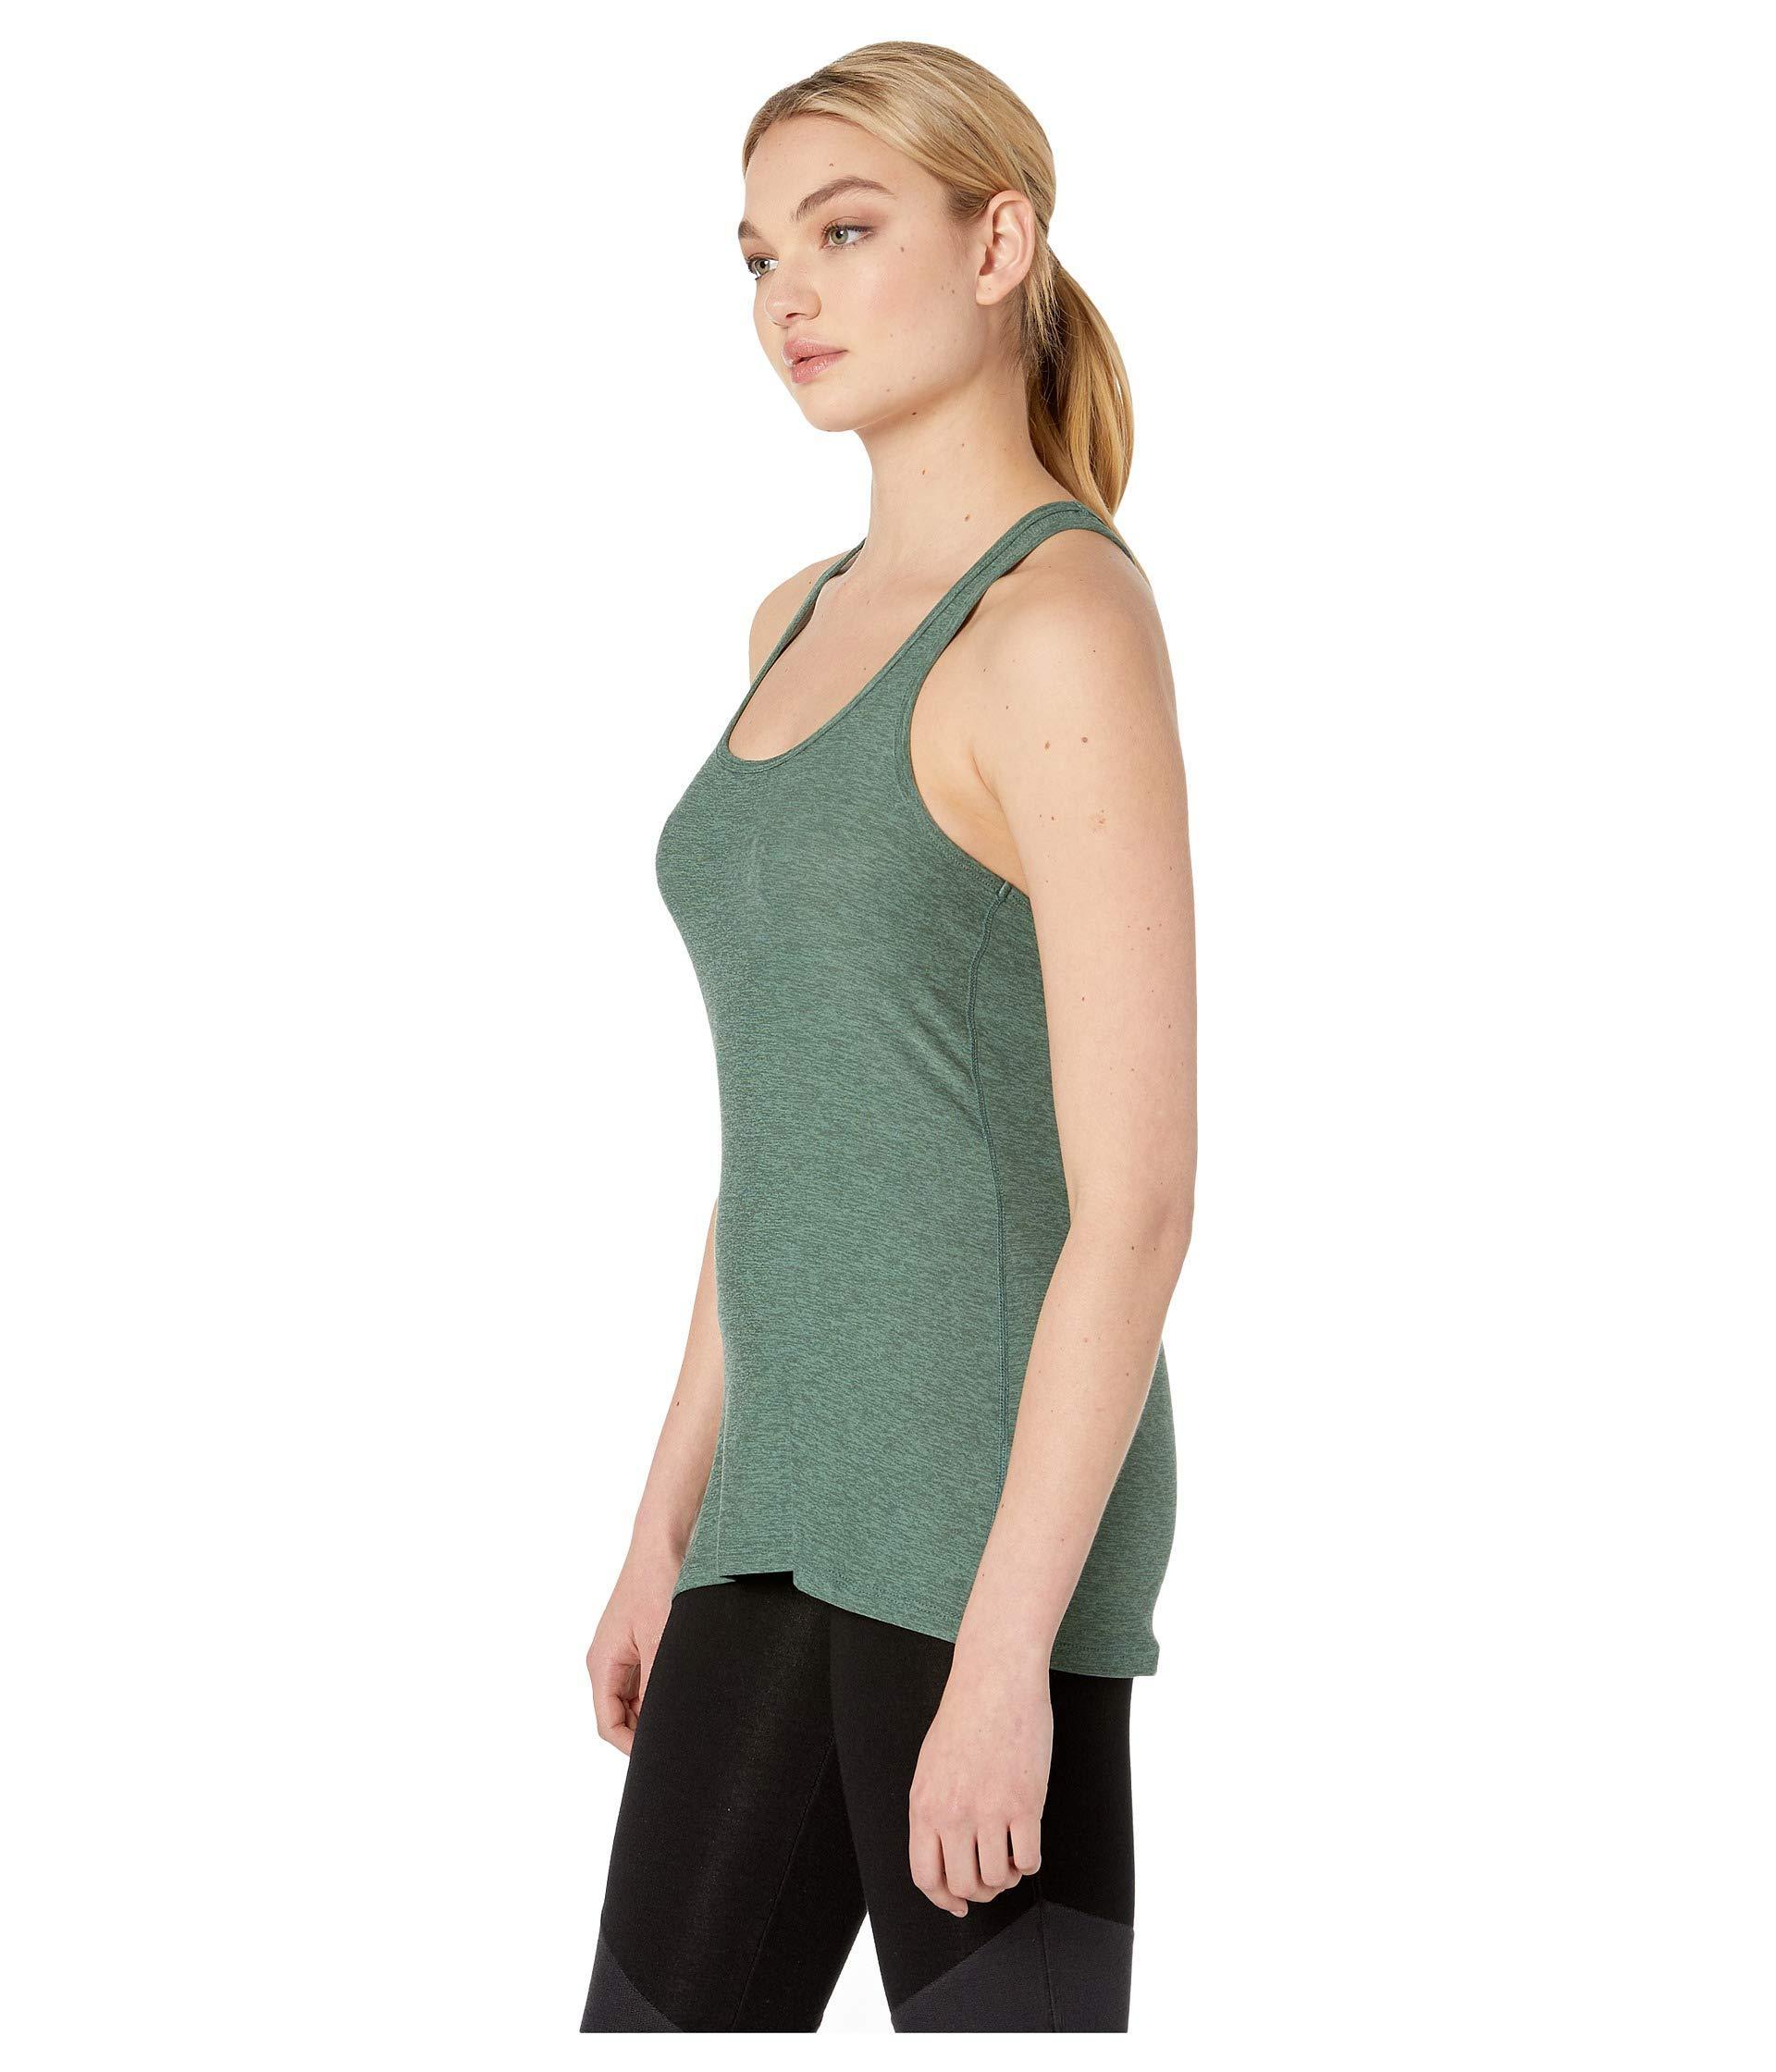 e1a2661f35c2b Lyst - Beyond Yoga Travel Lightweight Racerback Tank Top (aloha Green/dark  Tropic) Women's Sleeveless in Green